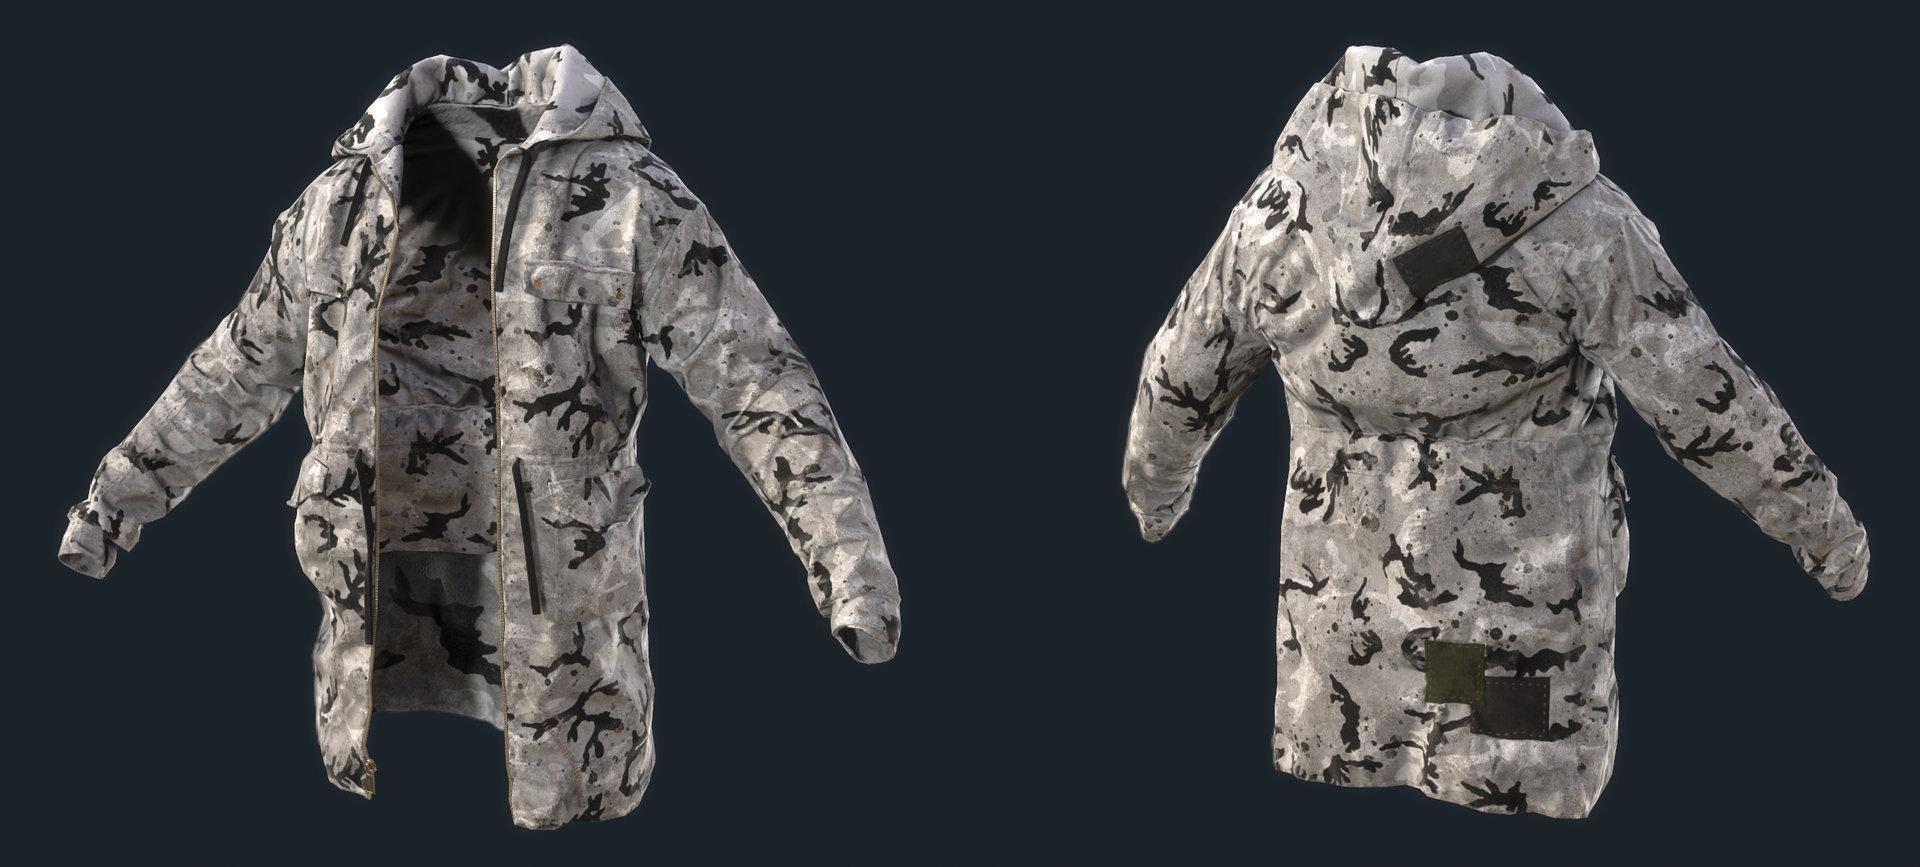 xavier-coelho-kostolny-jacket-mid-07.jpg